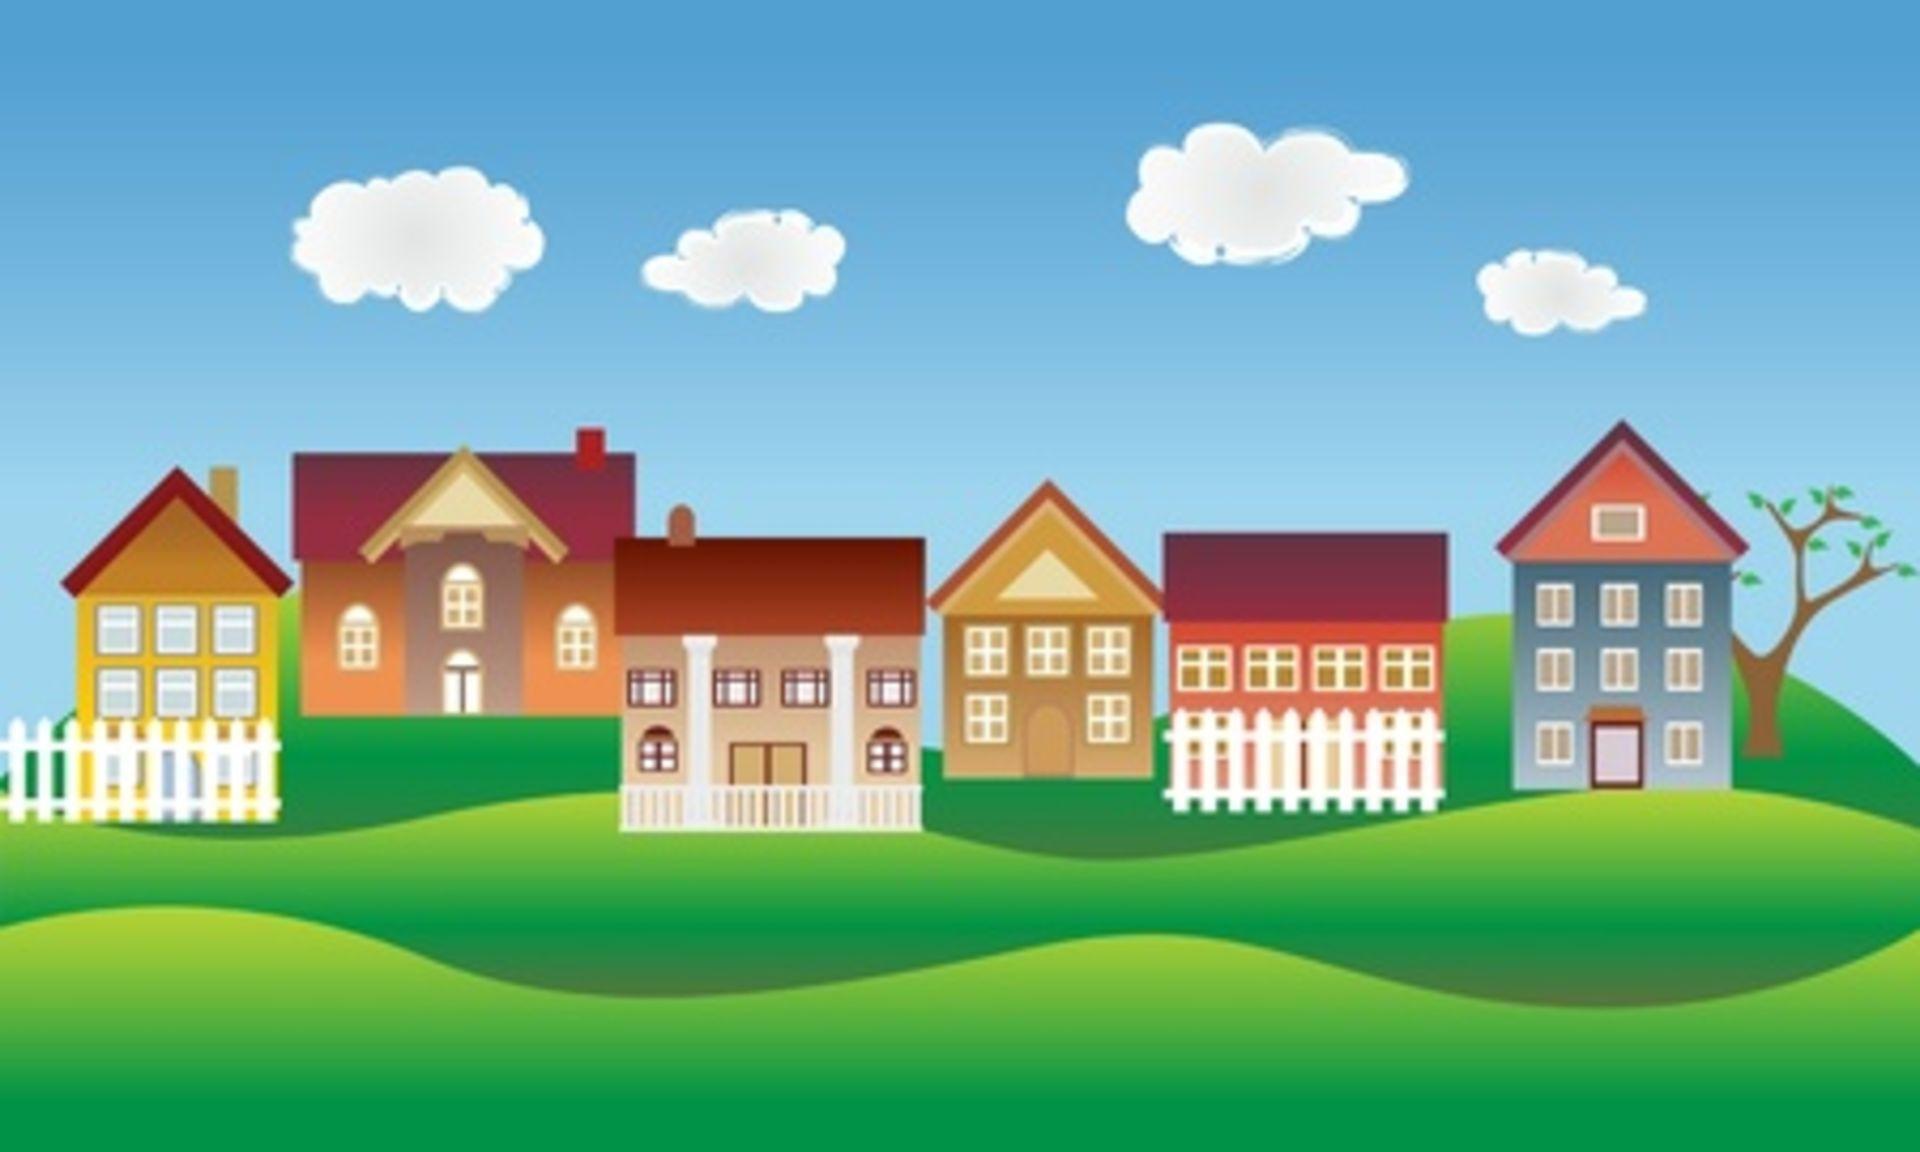 What Qualifies as a 'Dream Neighborhood'?